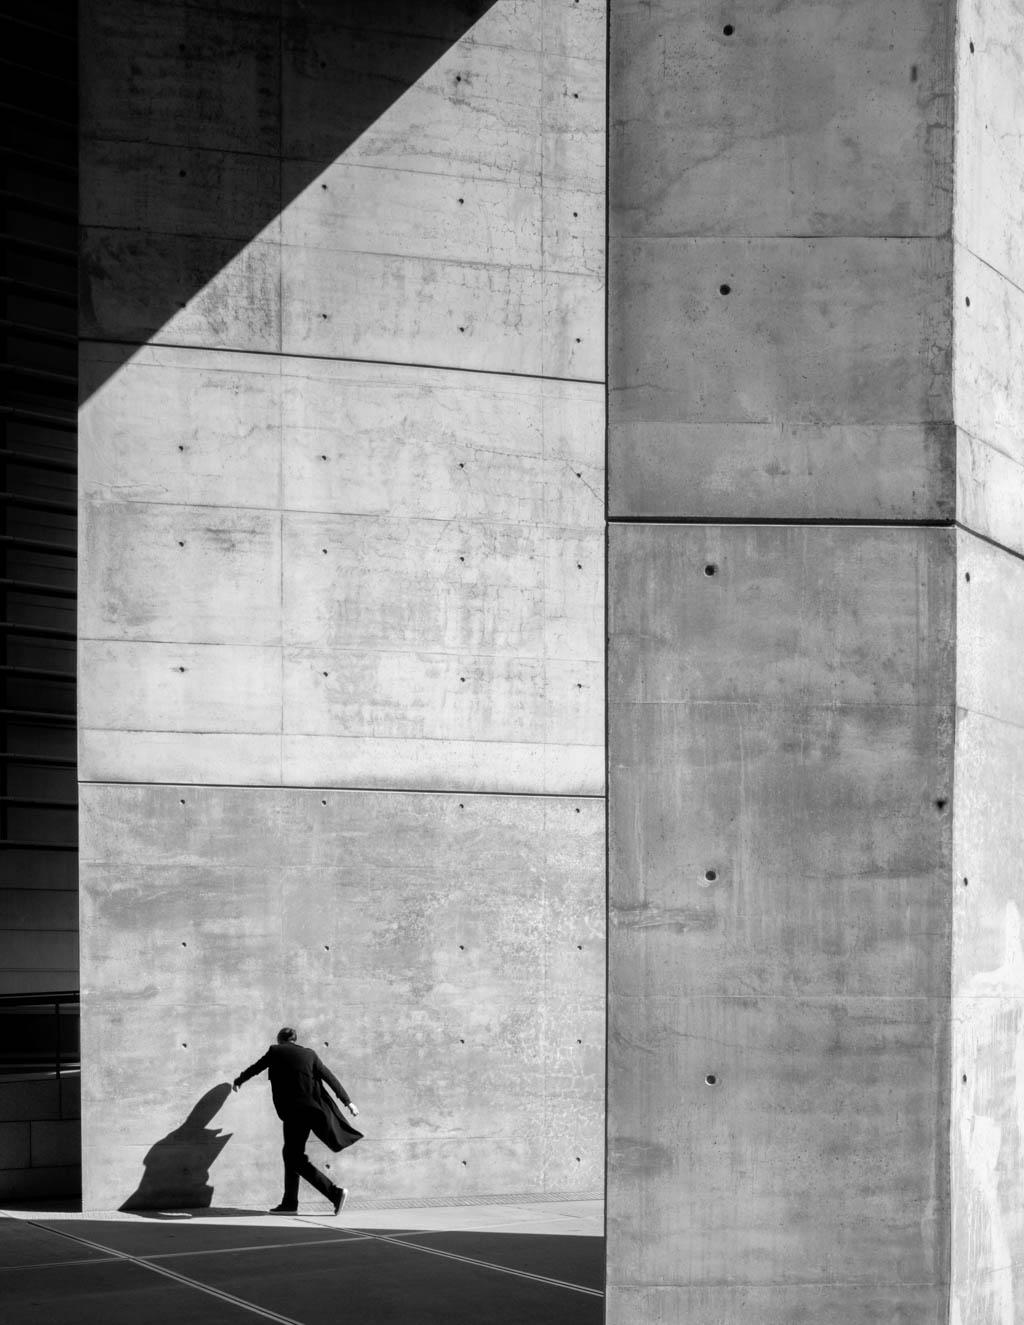 JonasBjerrePoulsen_Silhouette_II_Architectura_Web_1024x1325px